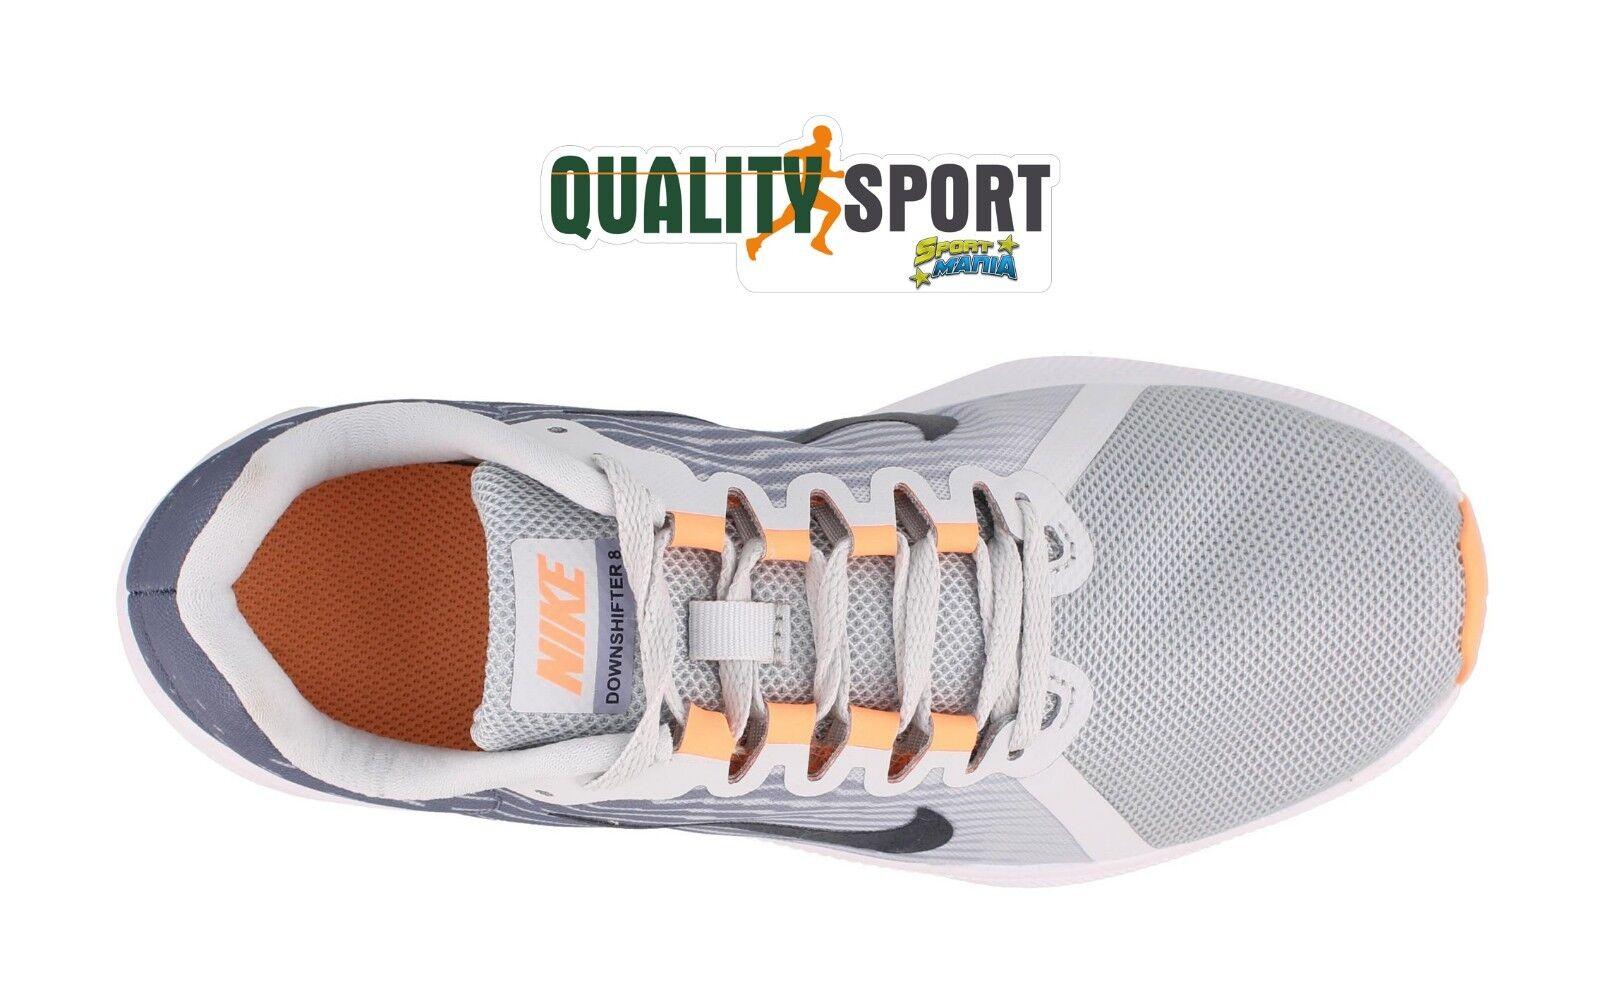 Nike Downshifter 8 Platino Corallo Schuhe Running Schuhes Damenschuhe Running Schuhe 908994 009 2018 af1a68